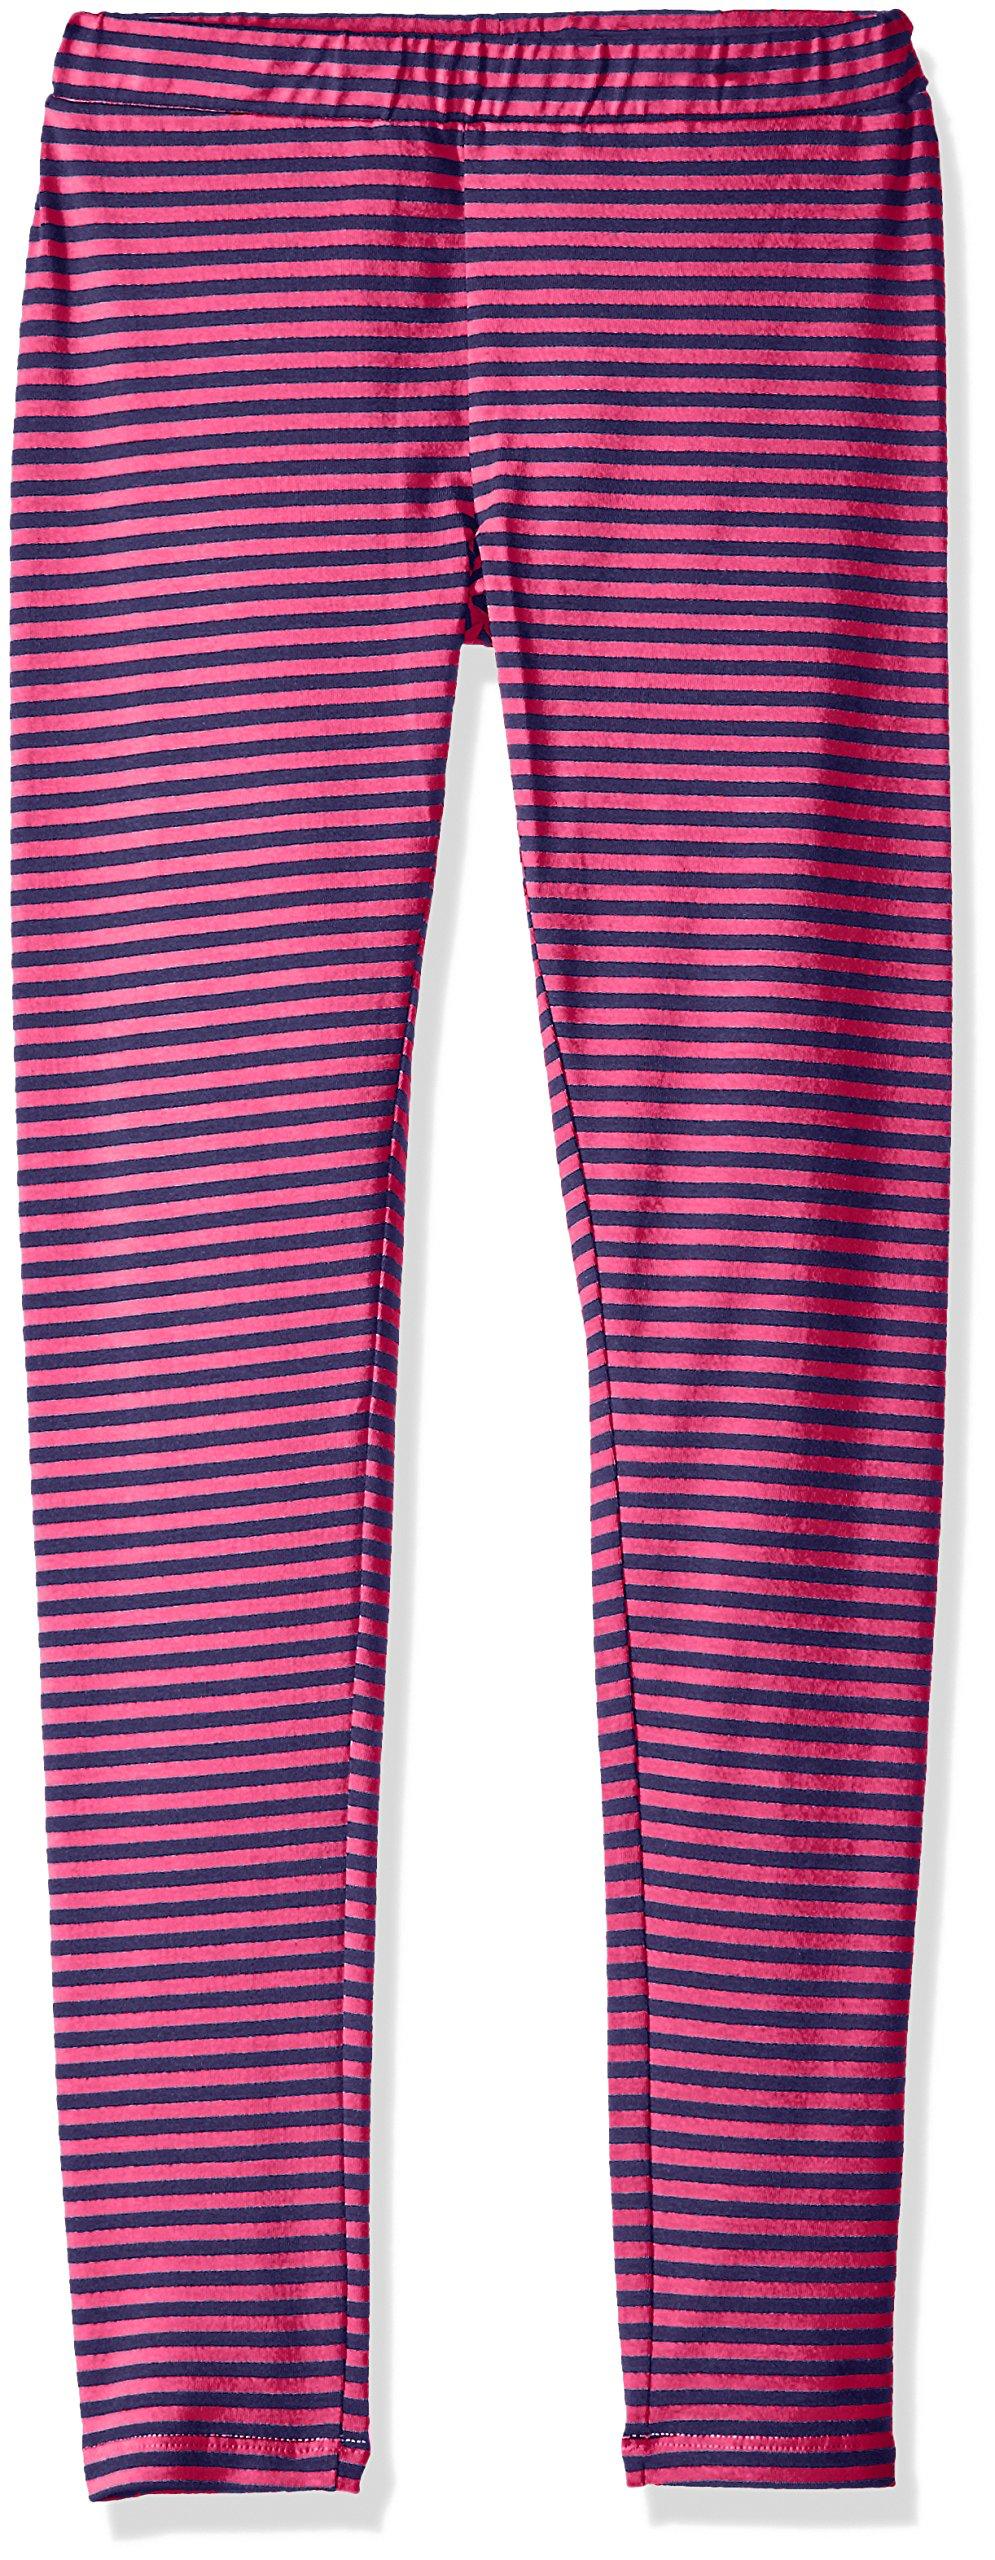 Scout + Ro Big Girls' Striped Jersey Legging, Lollipop, 7